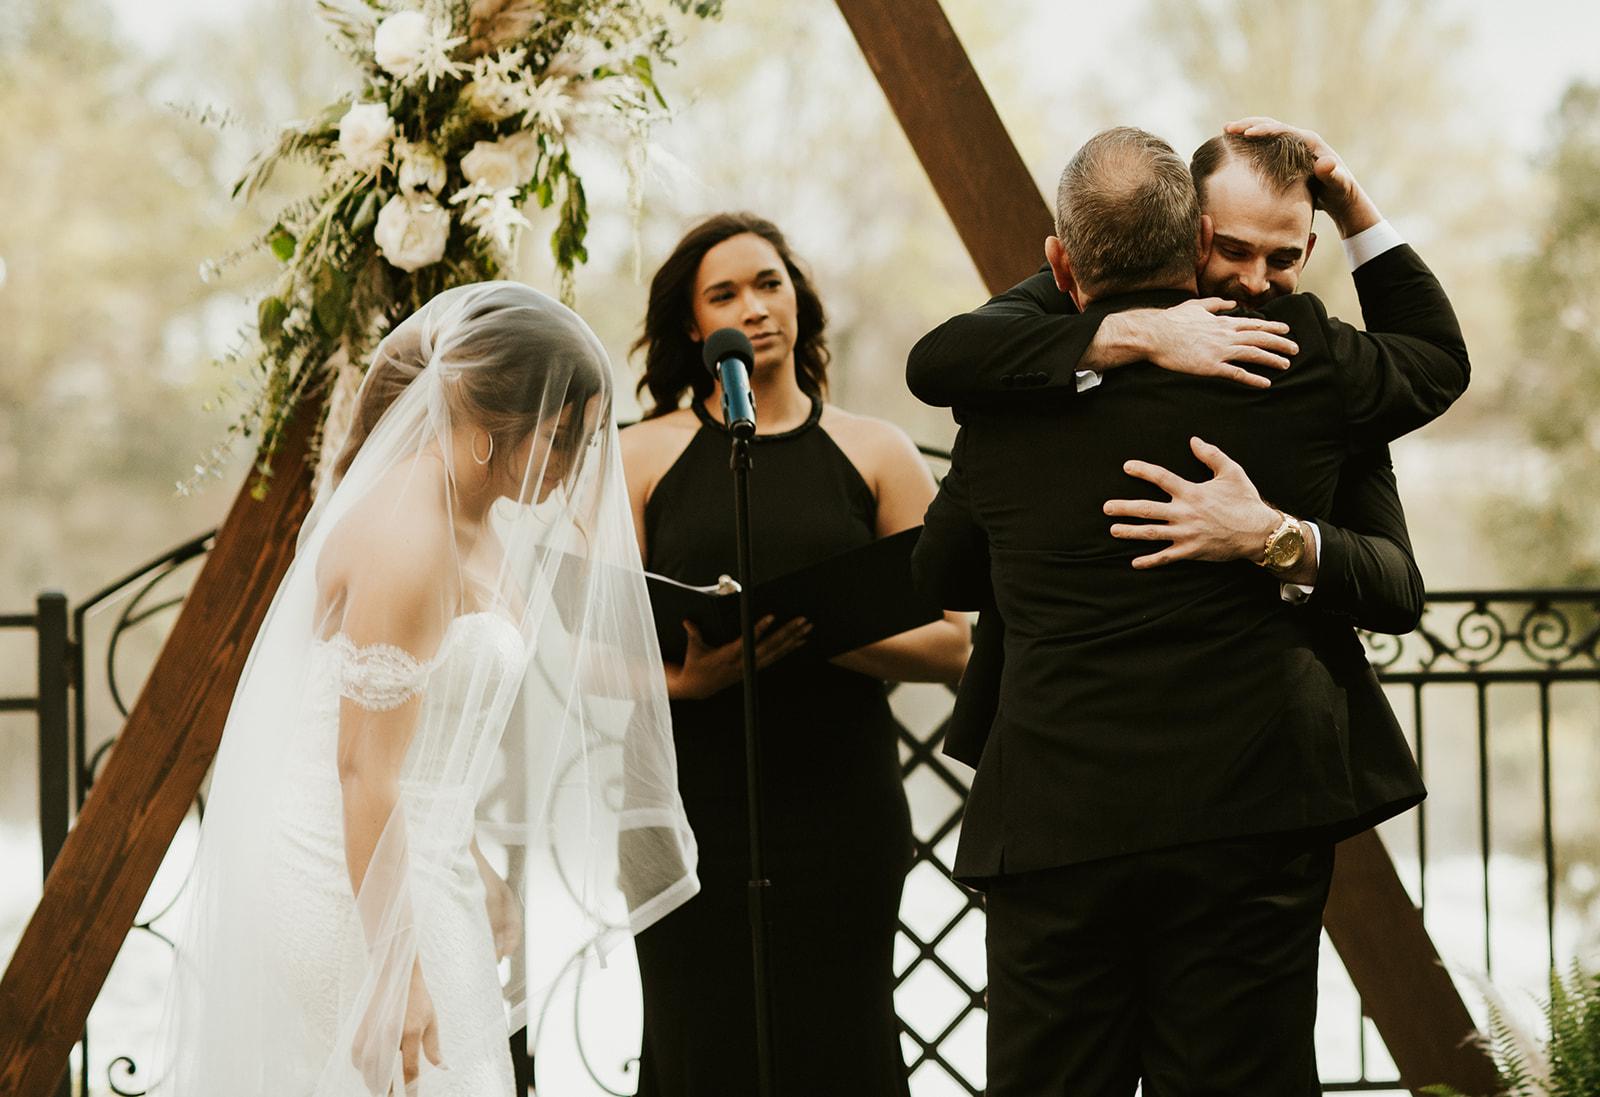 Chateau Rive Spokane Wedding Spokane Blog Dress hug father